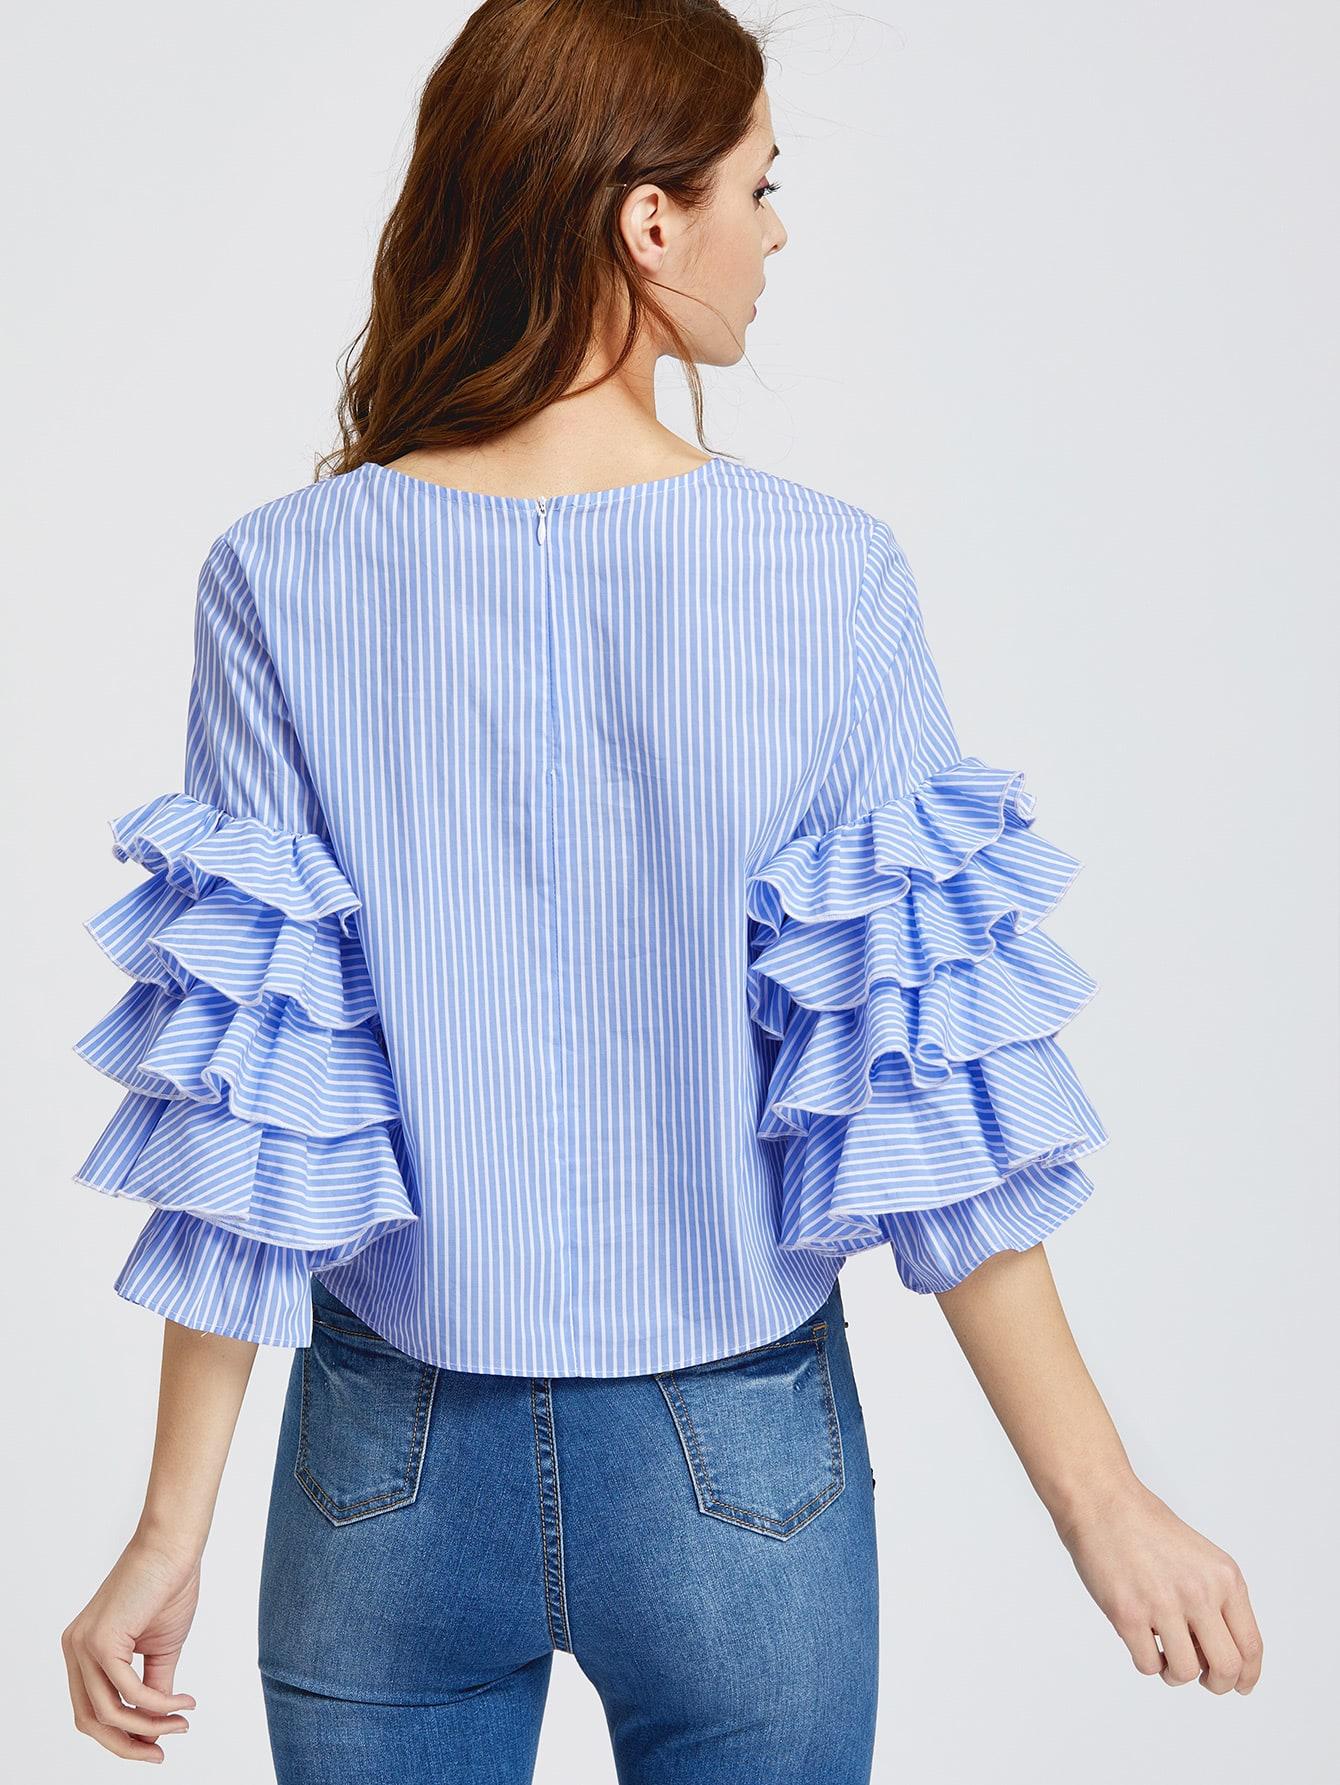 blouse170308703_2